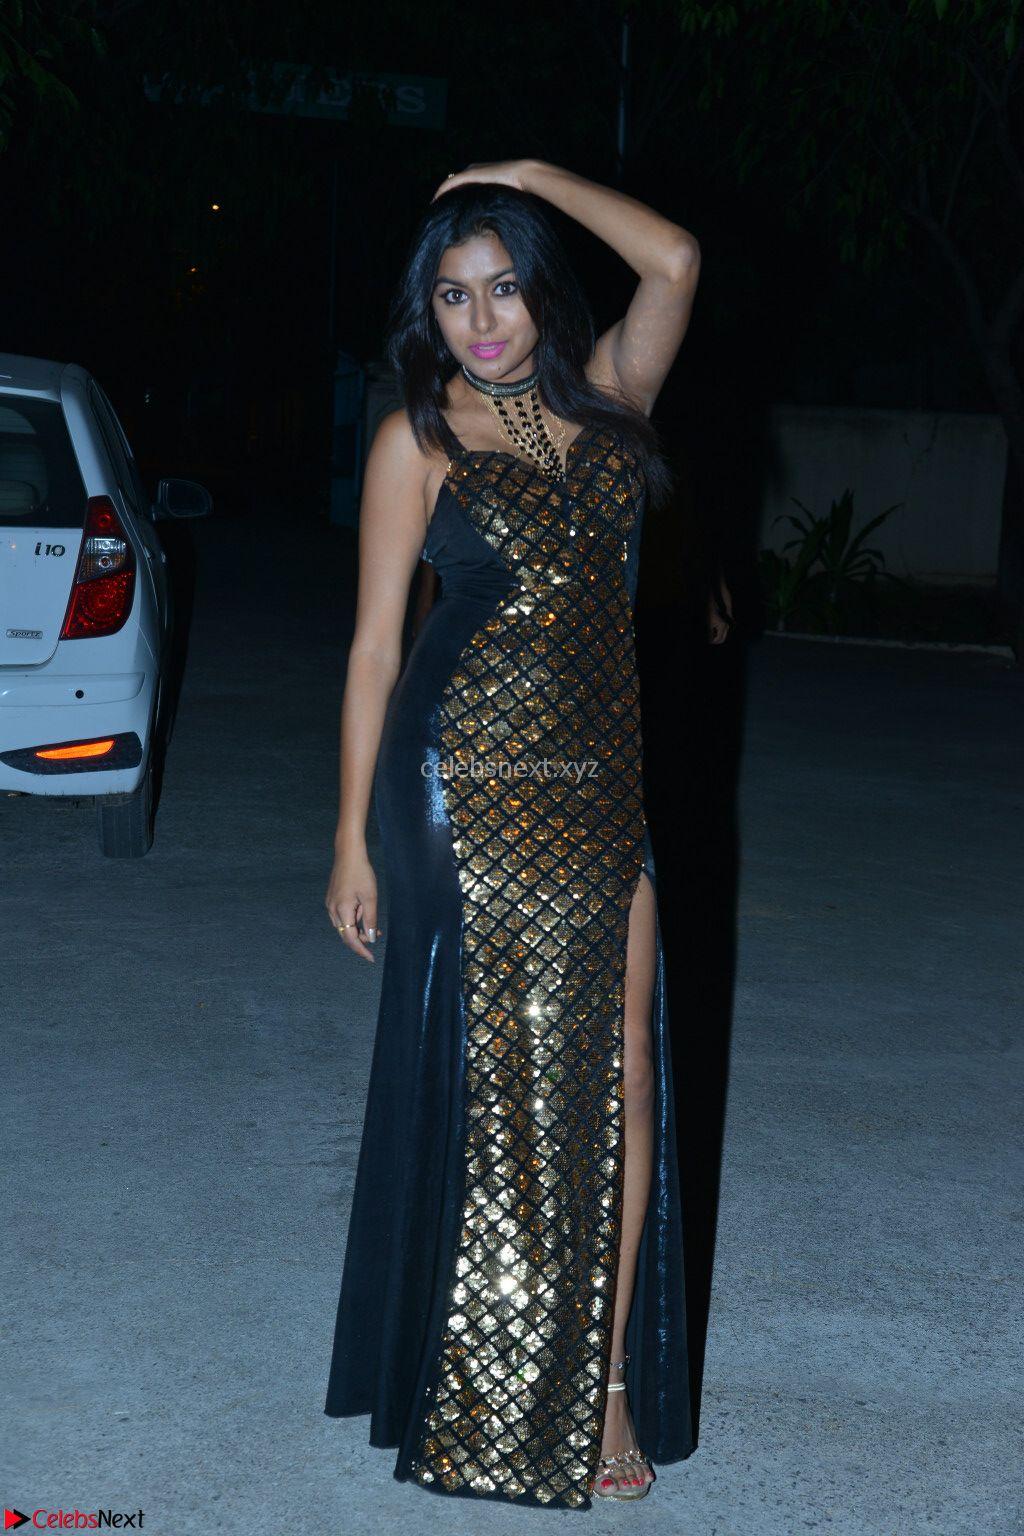 Sai Akshatha the black beauty in Black Deep Neck Lge Split Gown Exclusive Pics